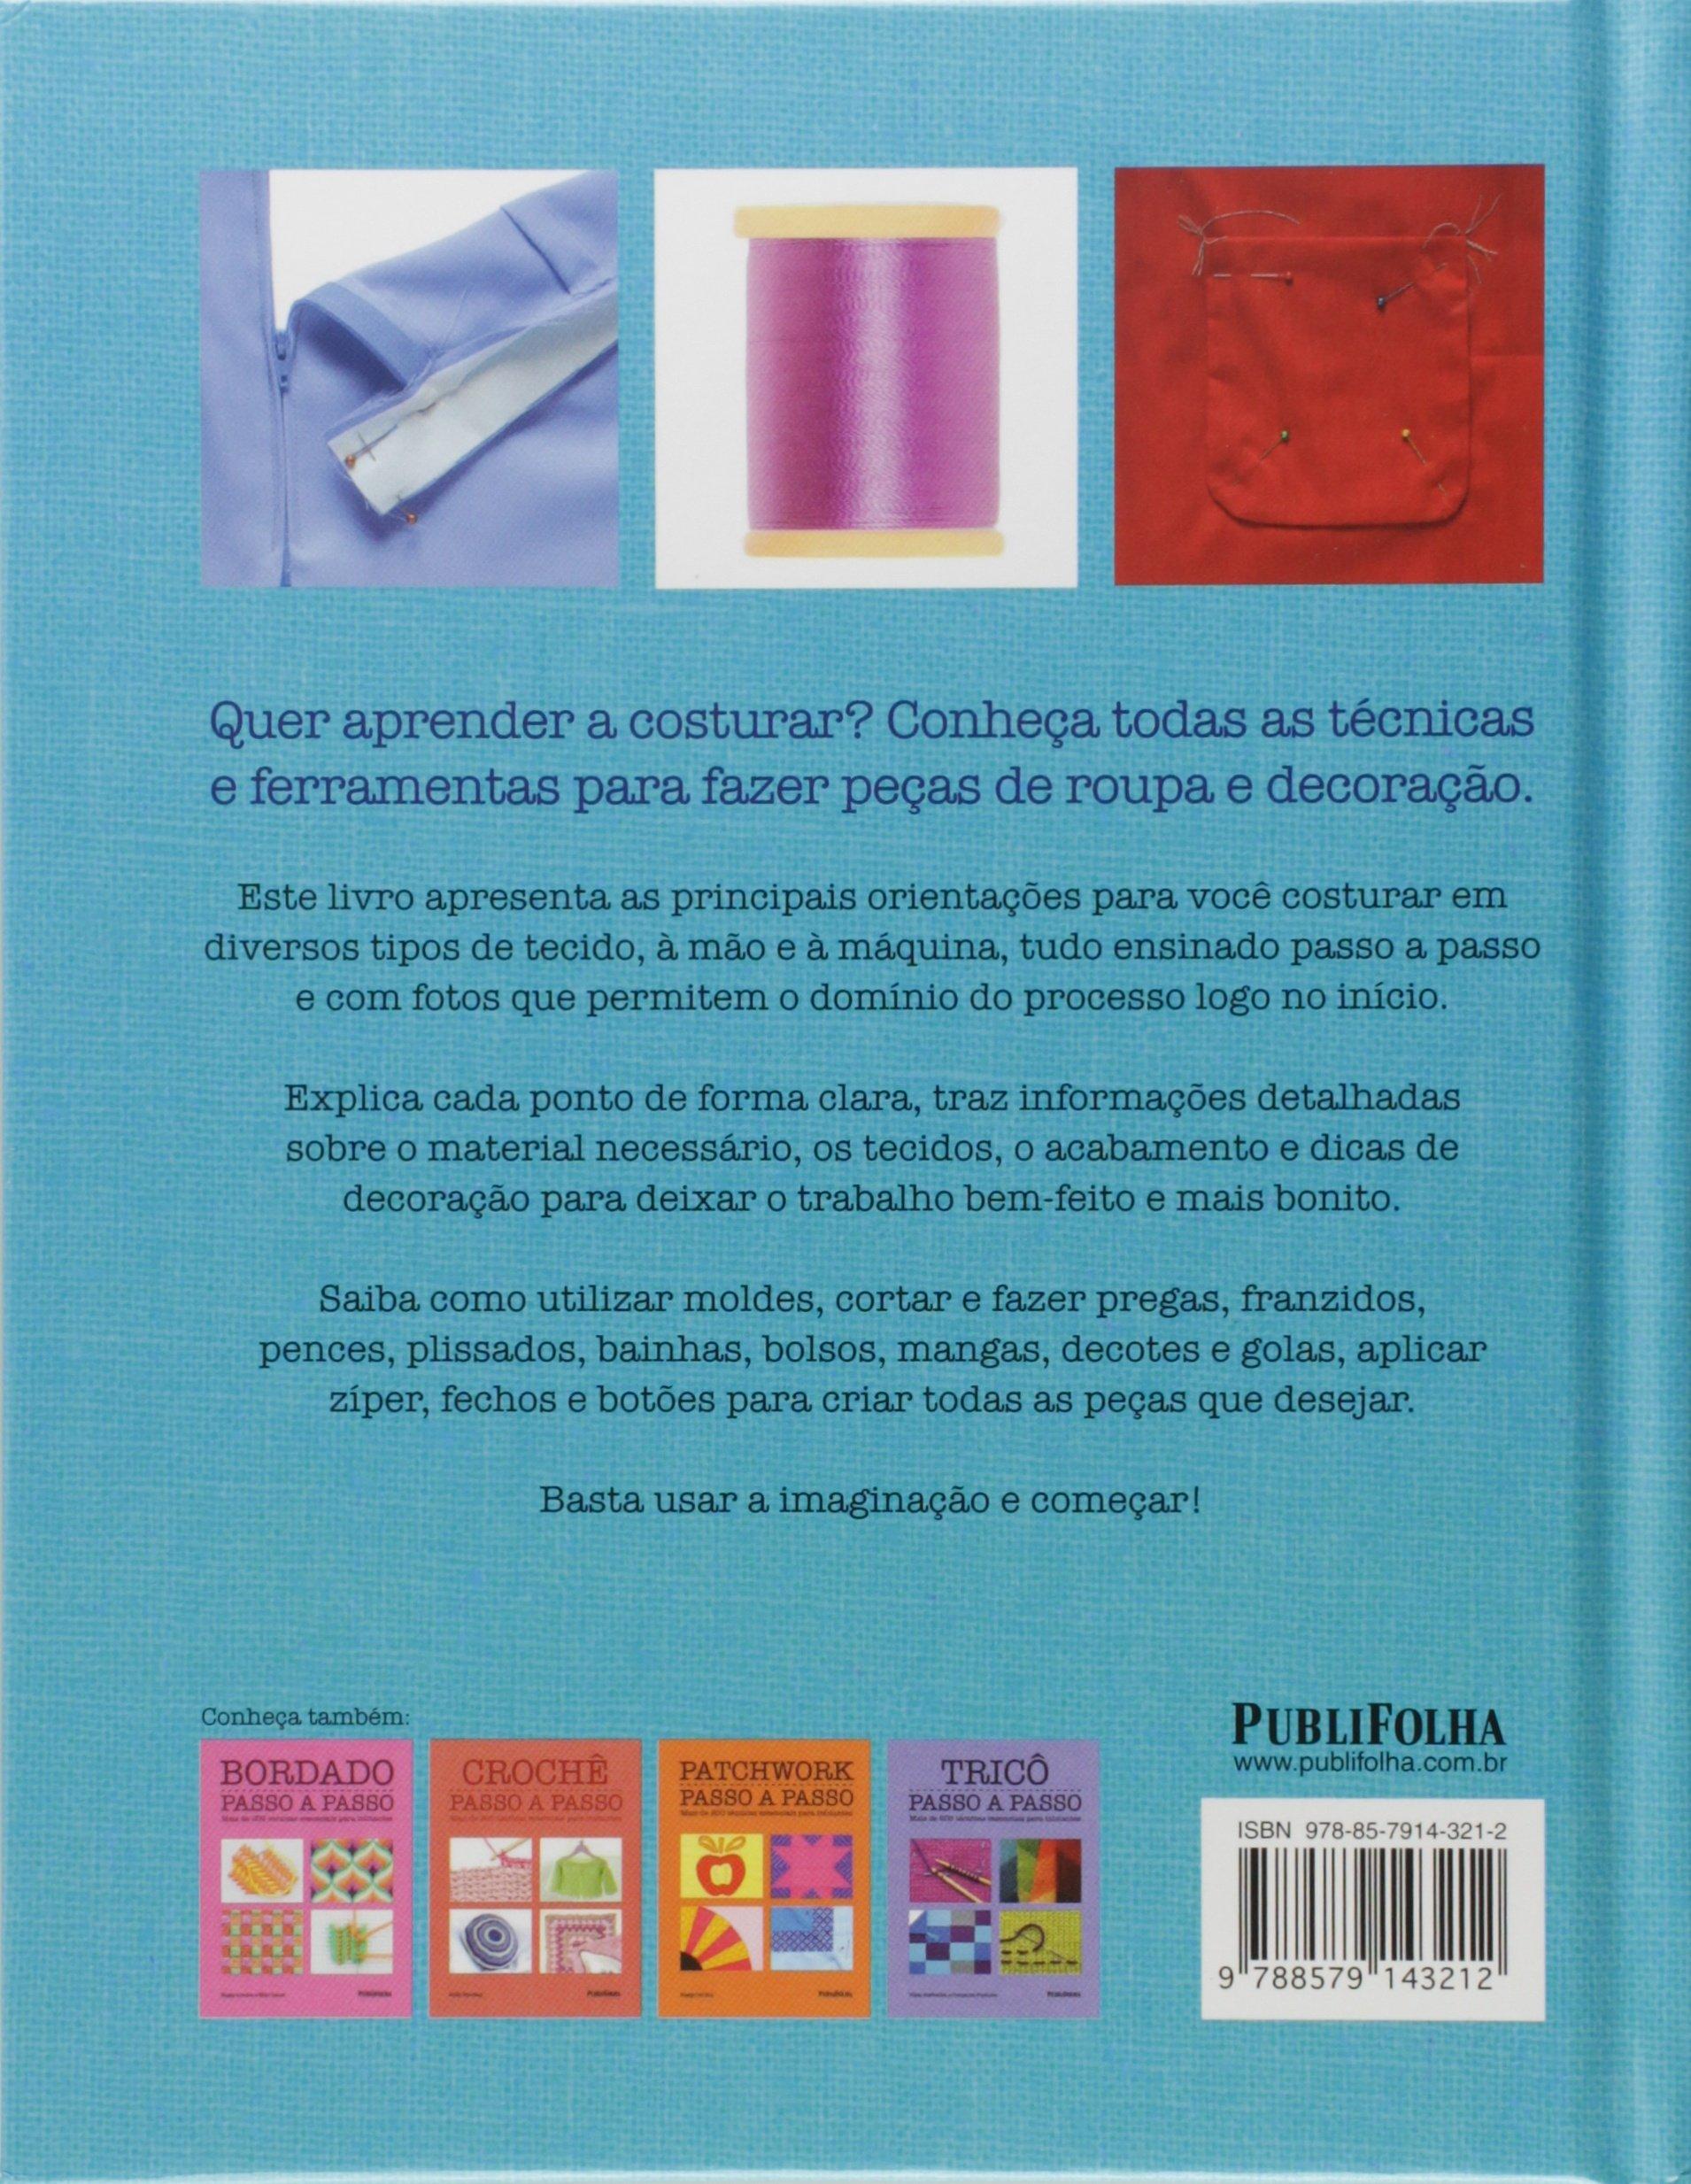 Costura Passo a Passo (Em Portuguese do Brasil): Amazon.es: Alison ...